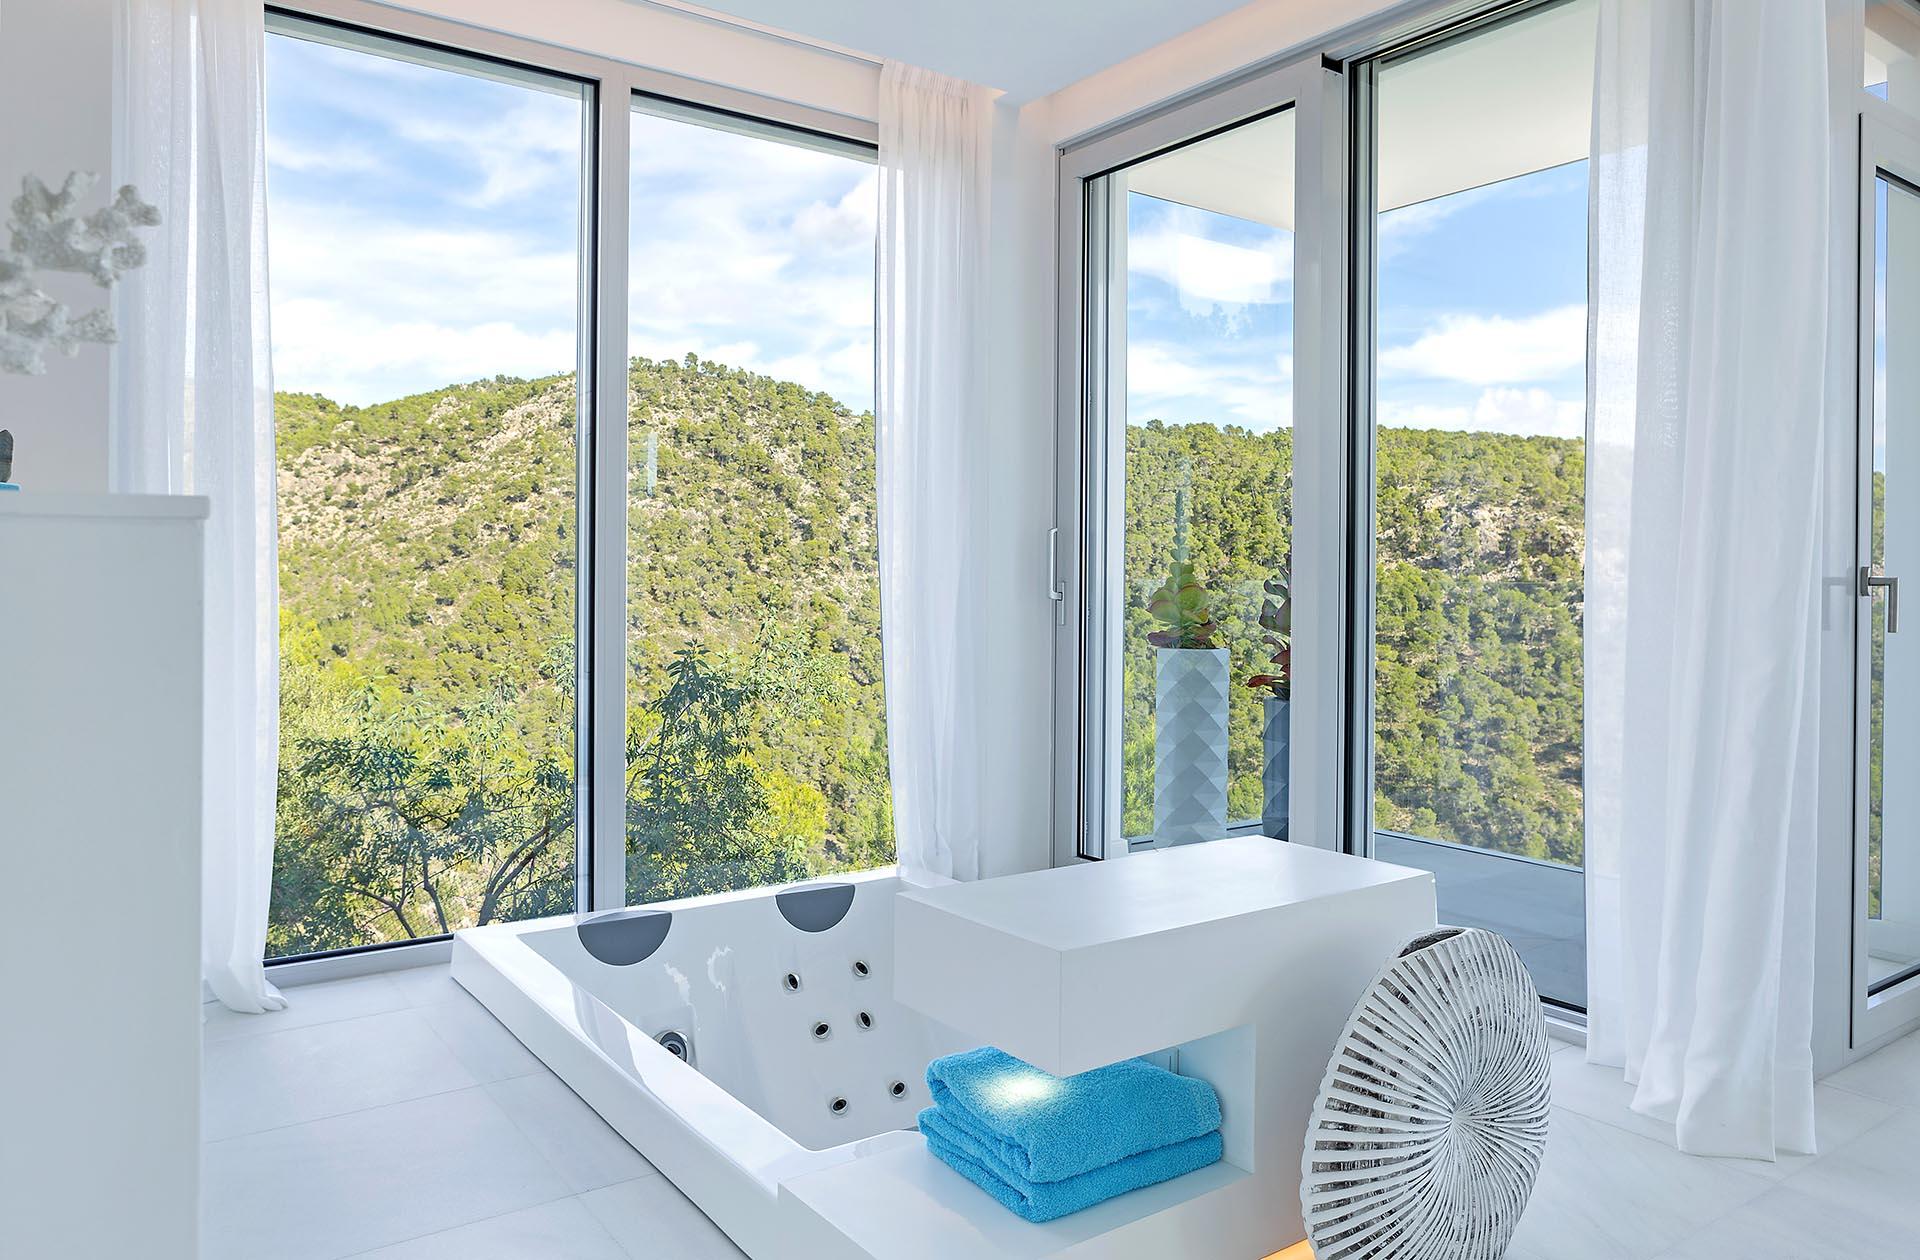 Beautiful modern villa in Costa den Blanes - Bathroom with jacuzzi